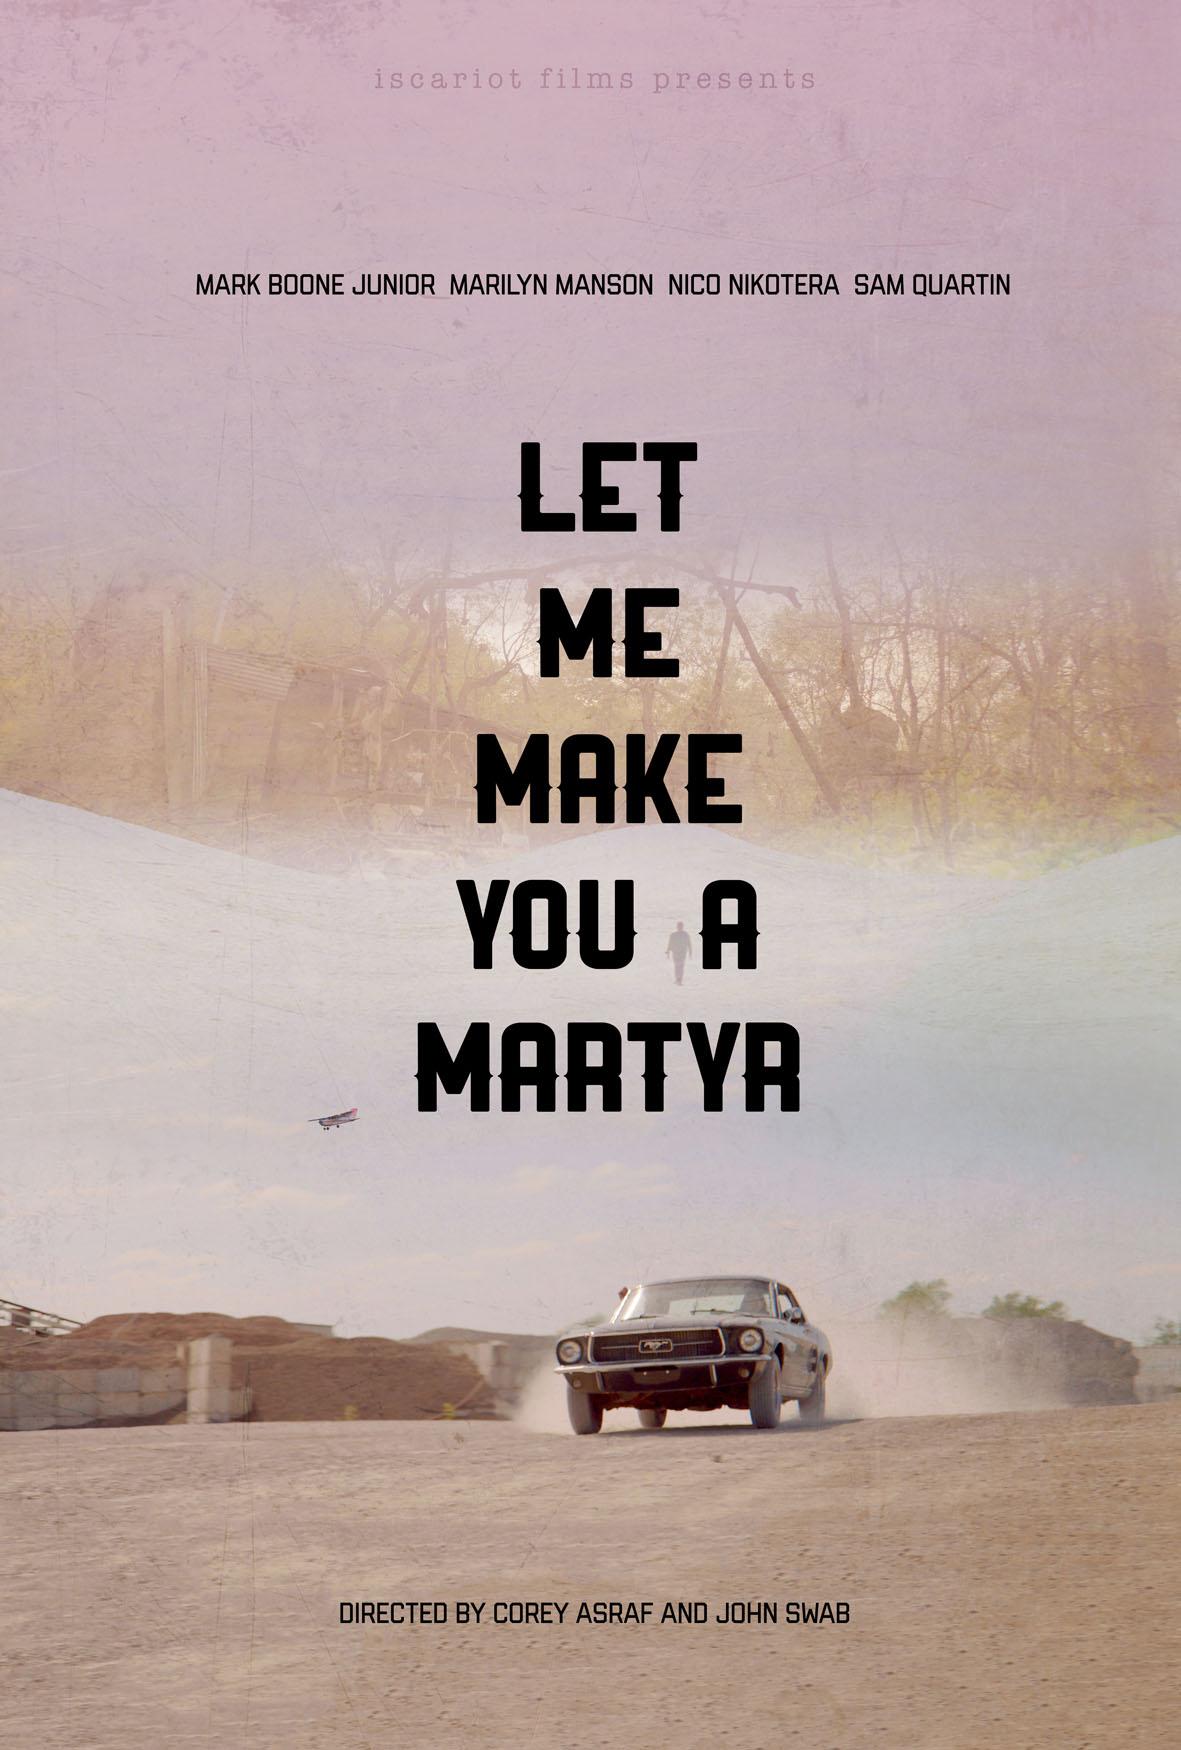 let-me-make-you-a-martyr-4